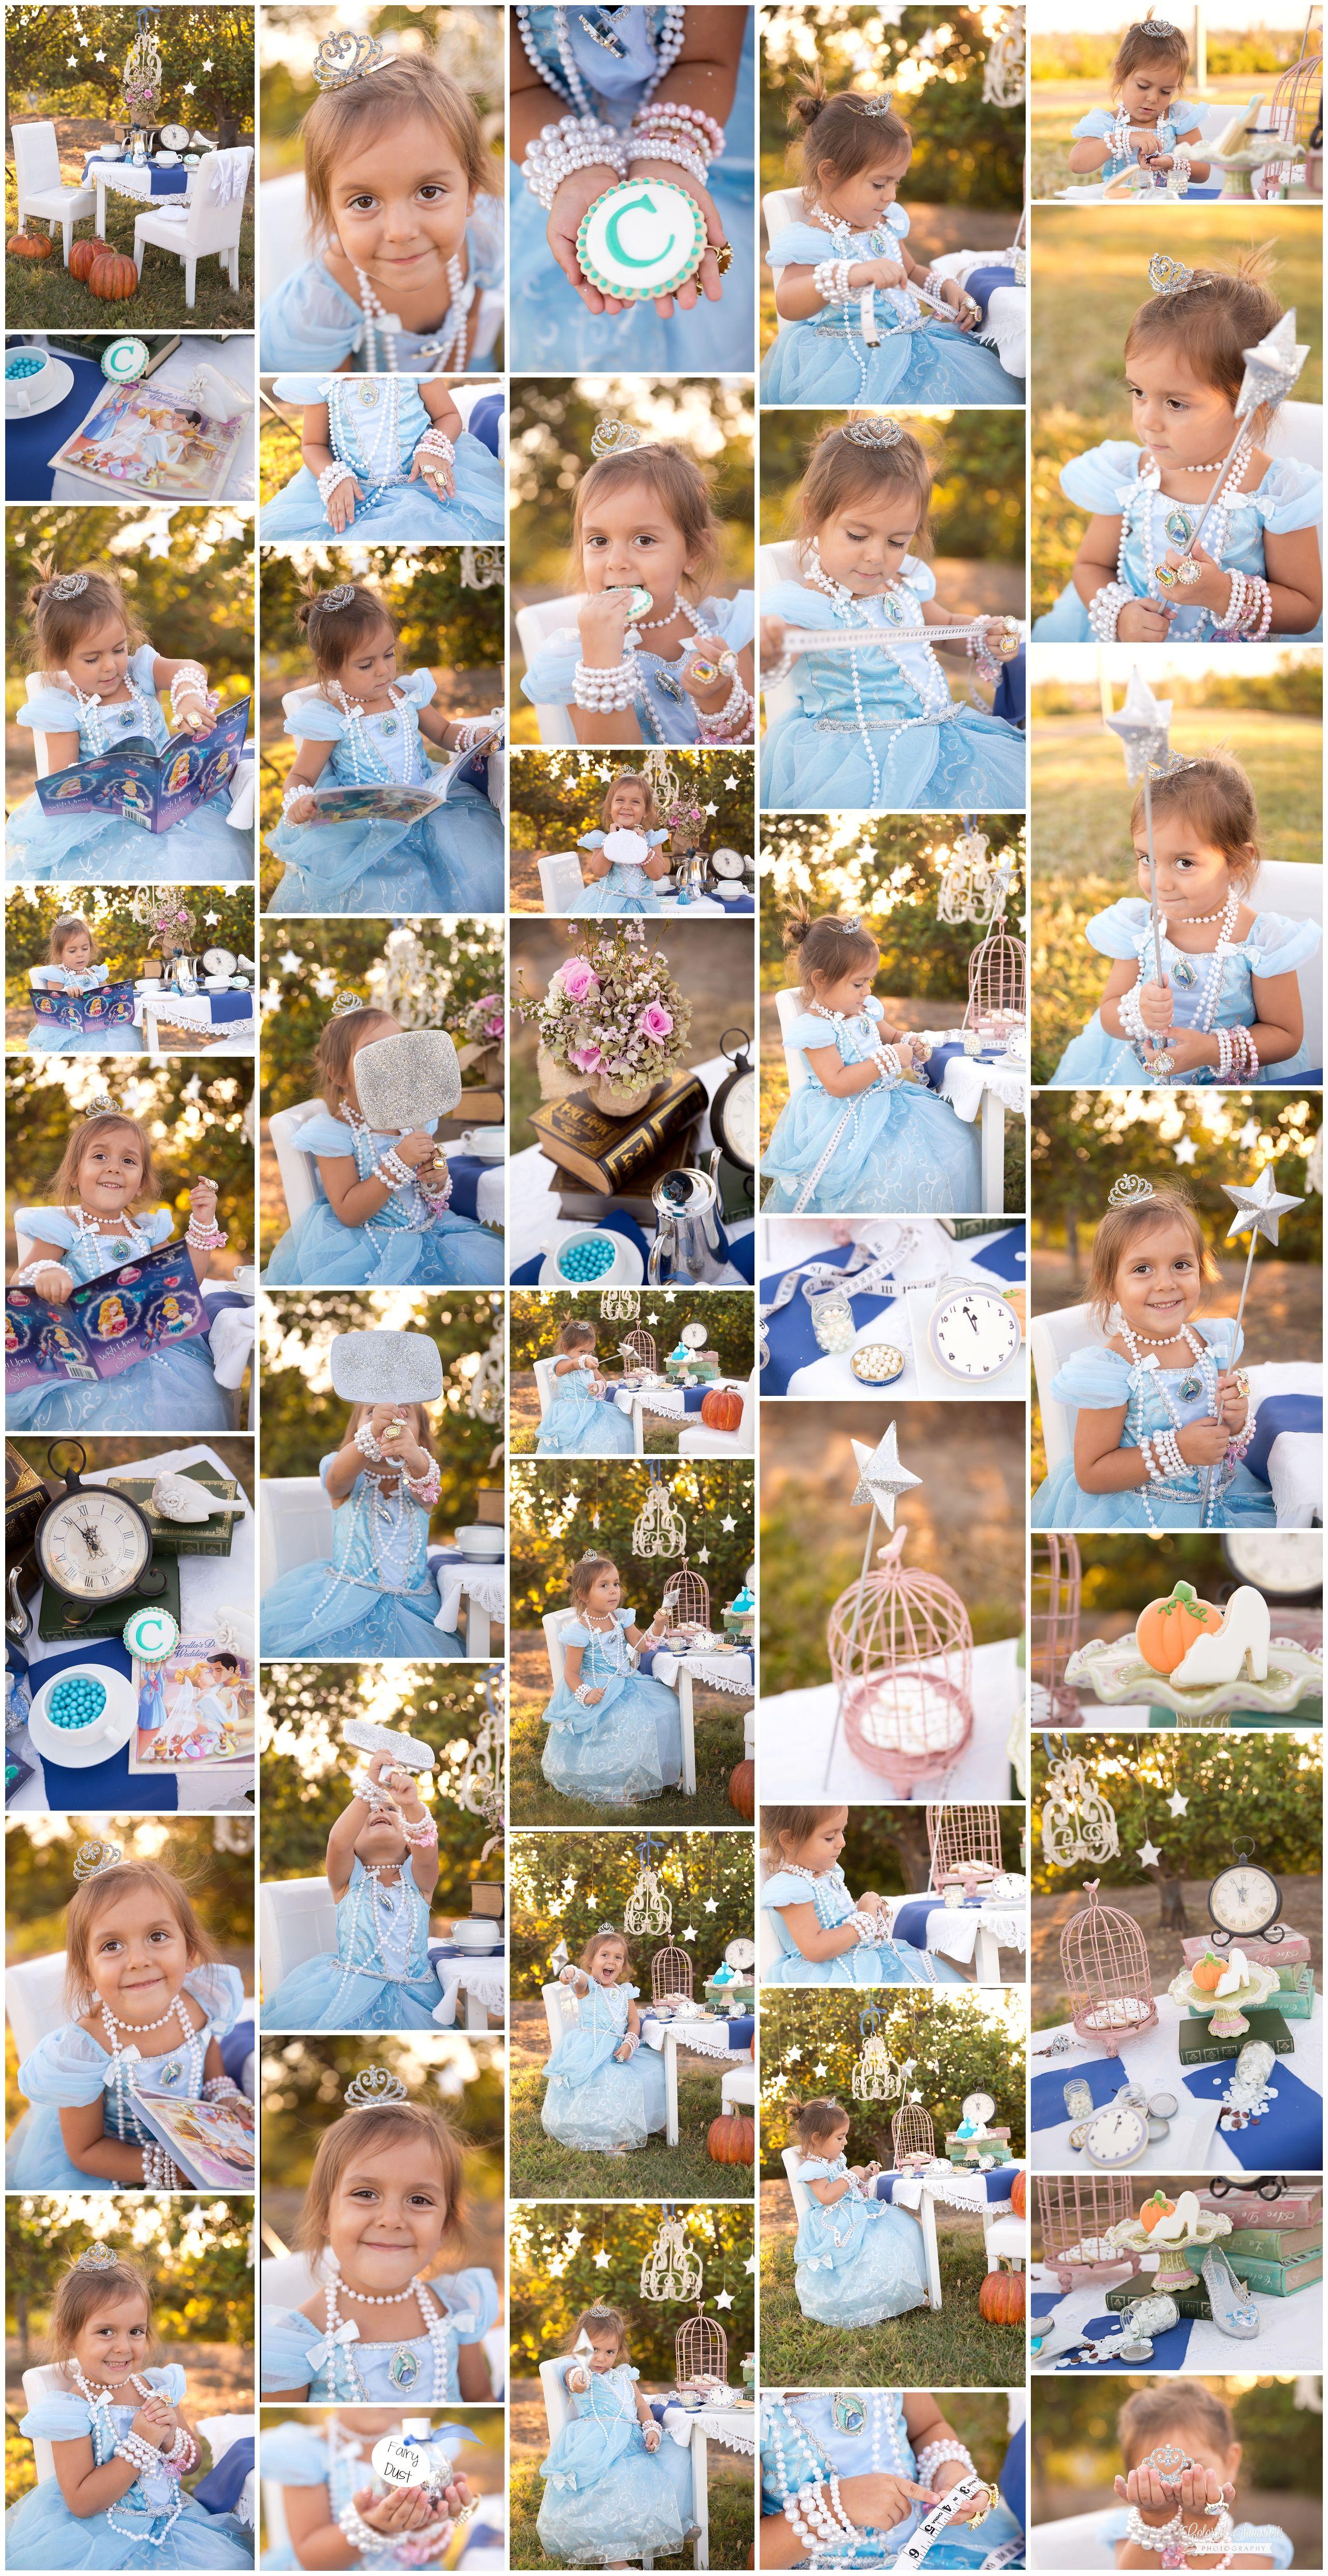 Cinderella Styled Shoot for 4Year old princess www.colorfulsnapshots.com #Colorfulsnapshotphotography #toddler #kids #cinderella #orangecountycaliforniaphotographer